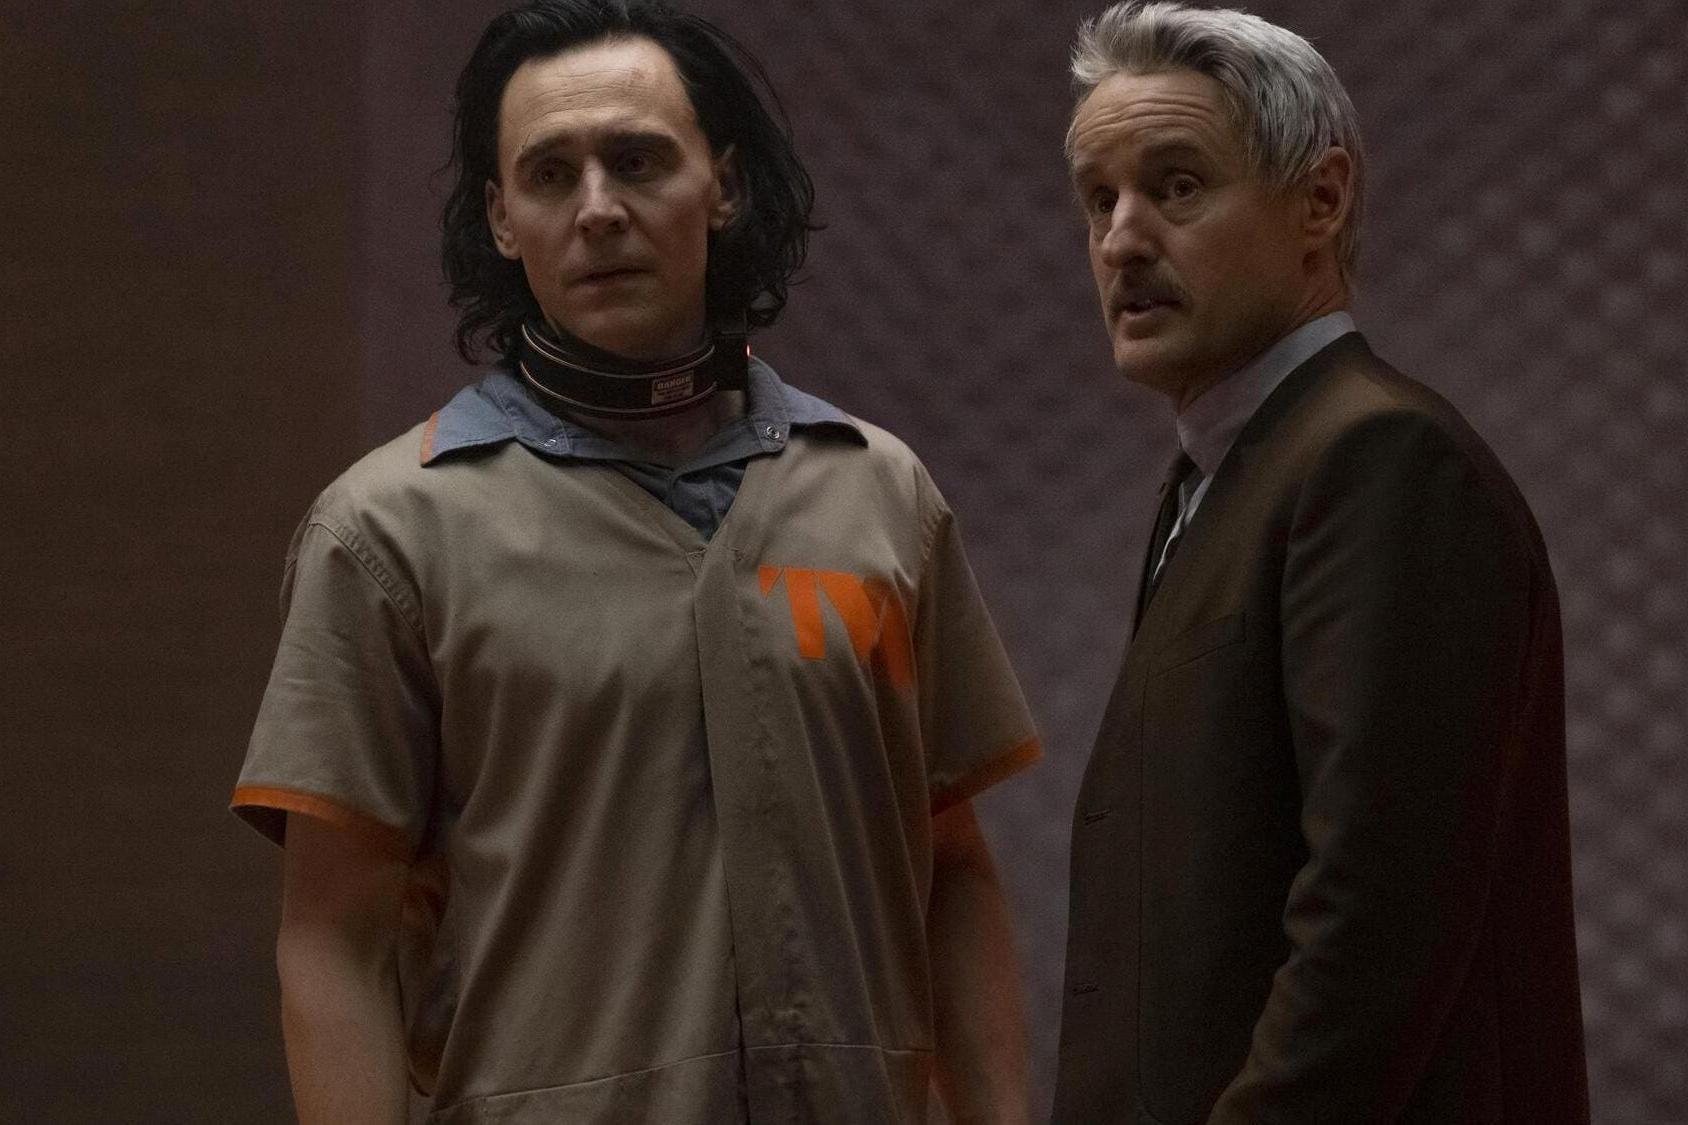 (L-R): Loki (Tom Hiddleston) and Mobius (Owen Wilson) in©Marvel Studios' LOKI, exclusively on Disney+